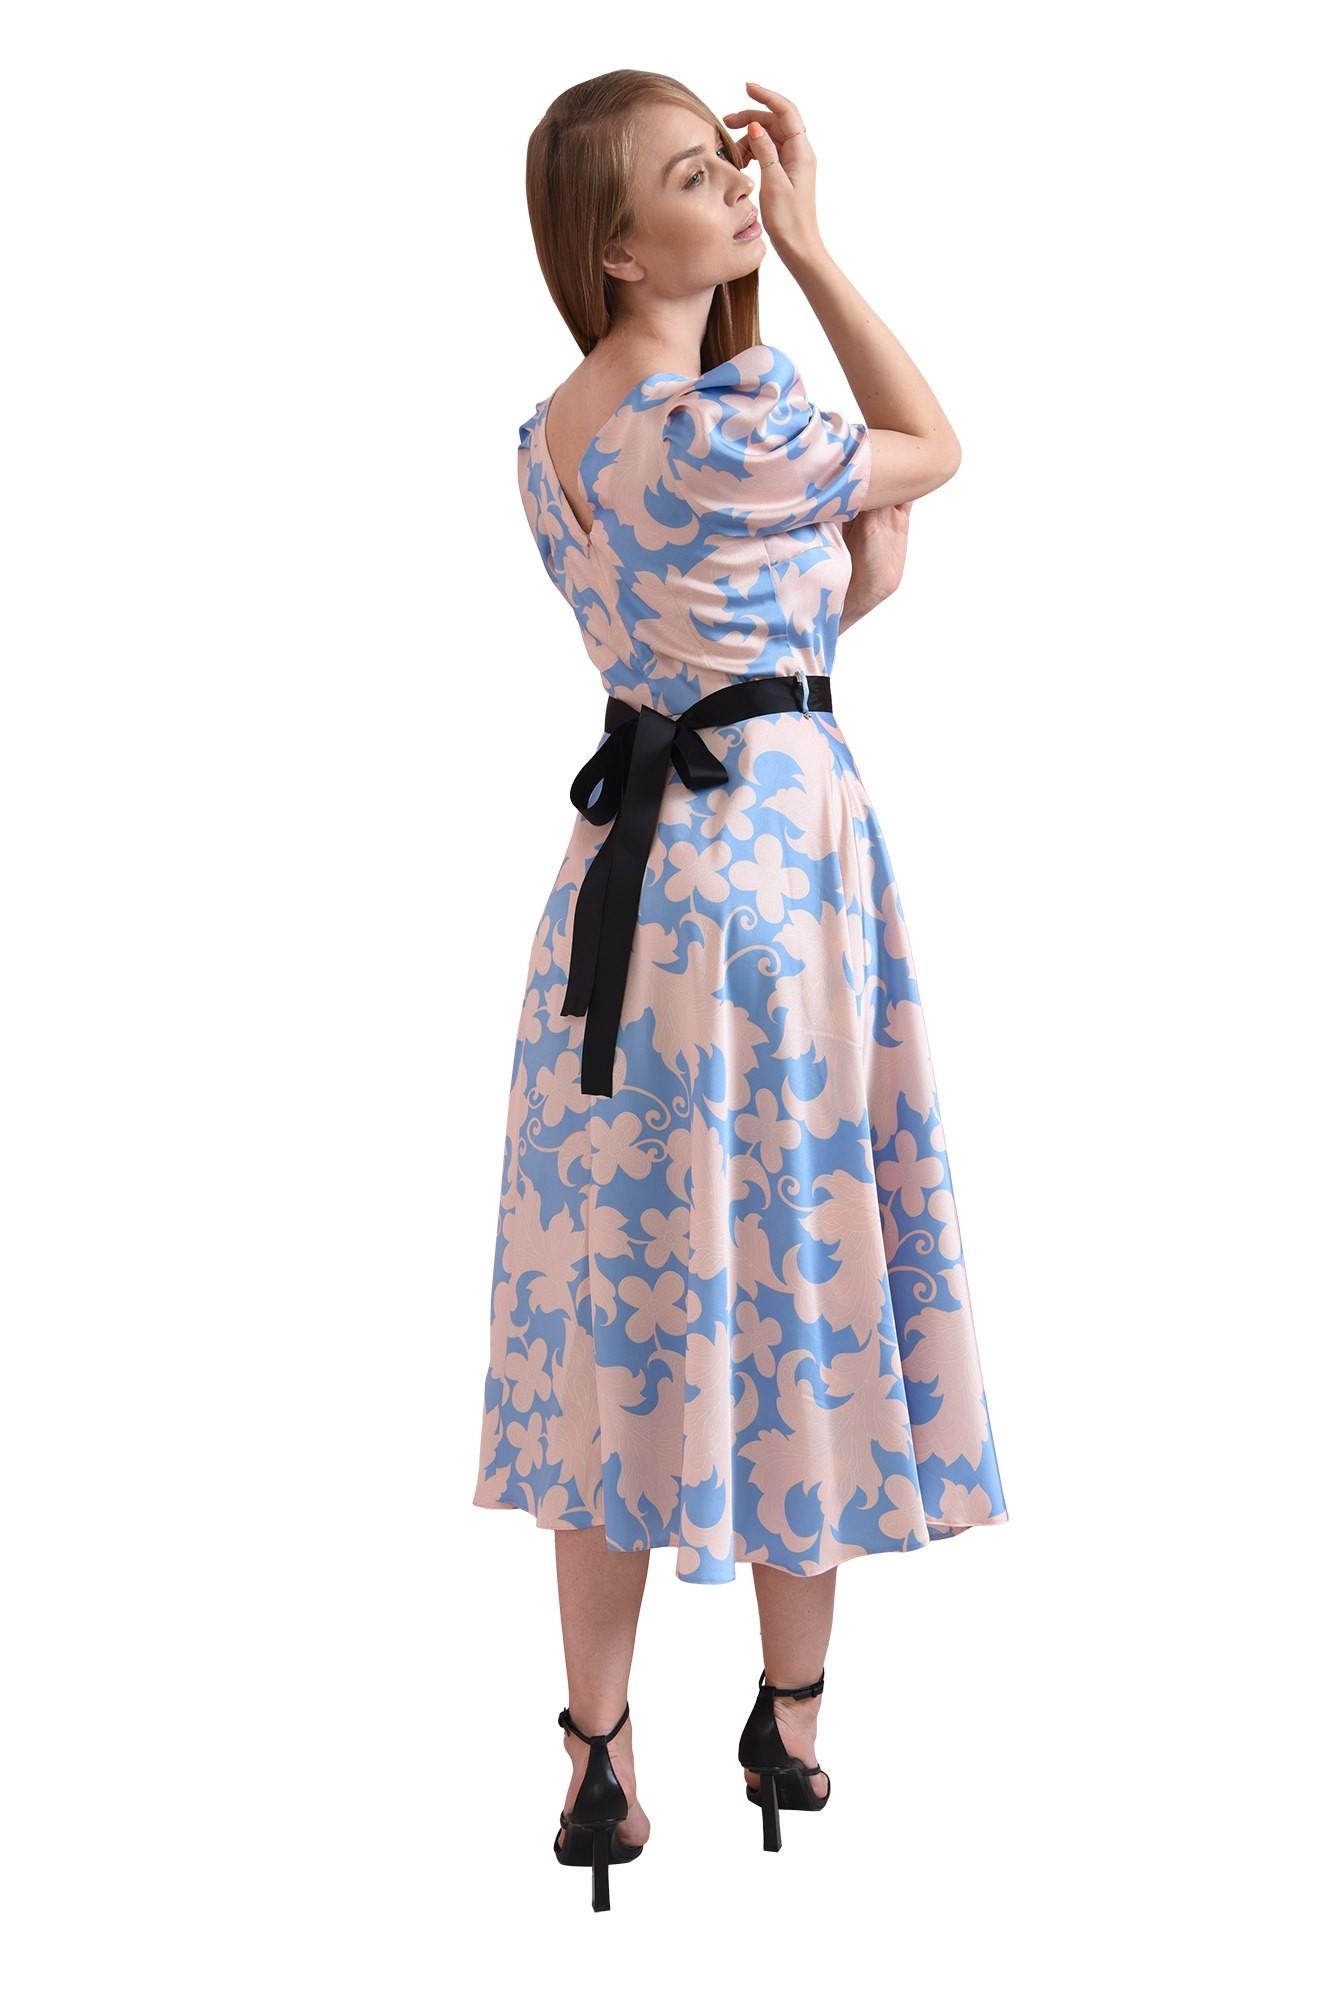 3 - rochie evazata, bleu, cu flori